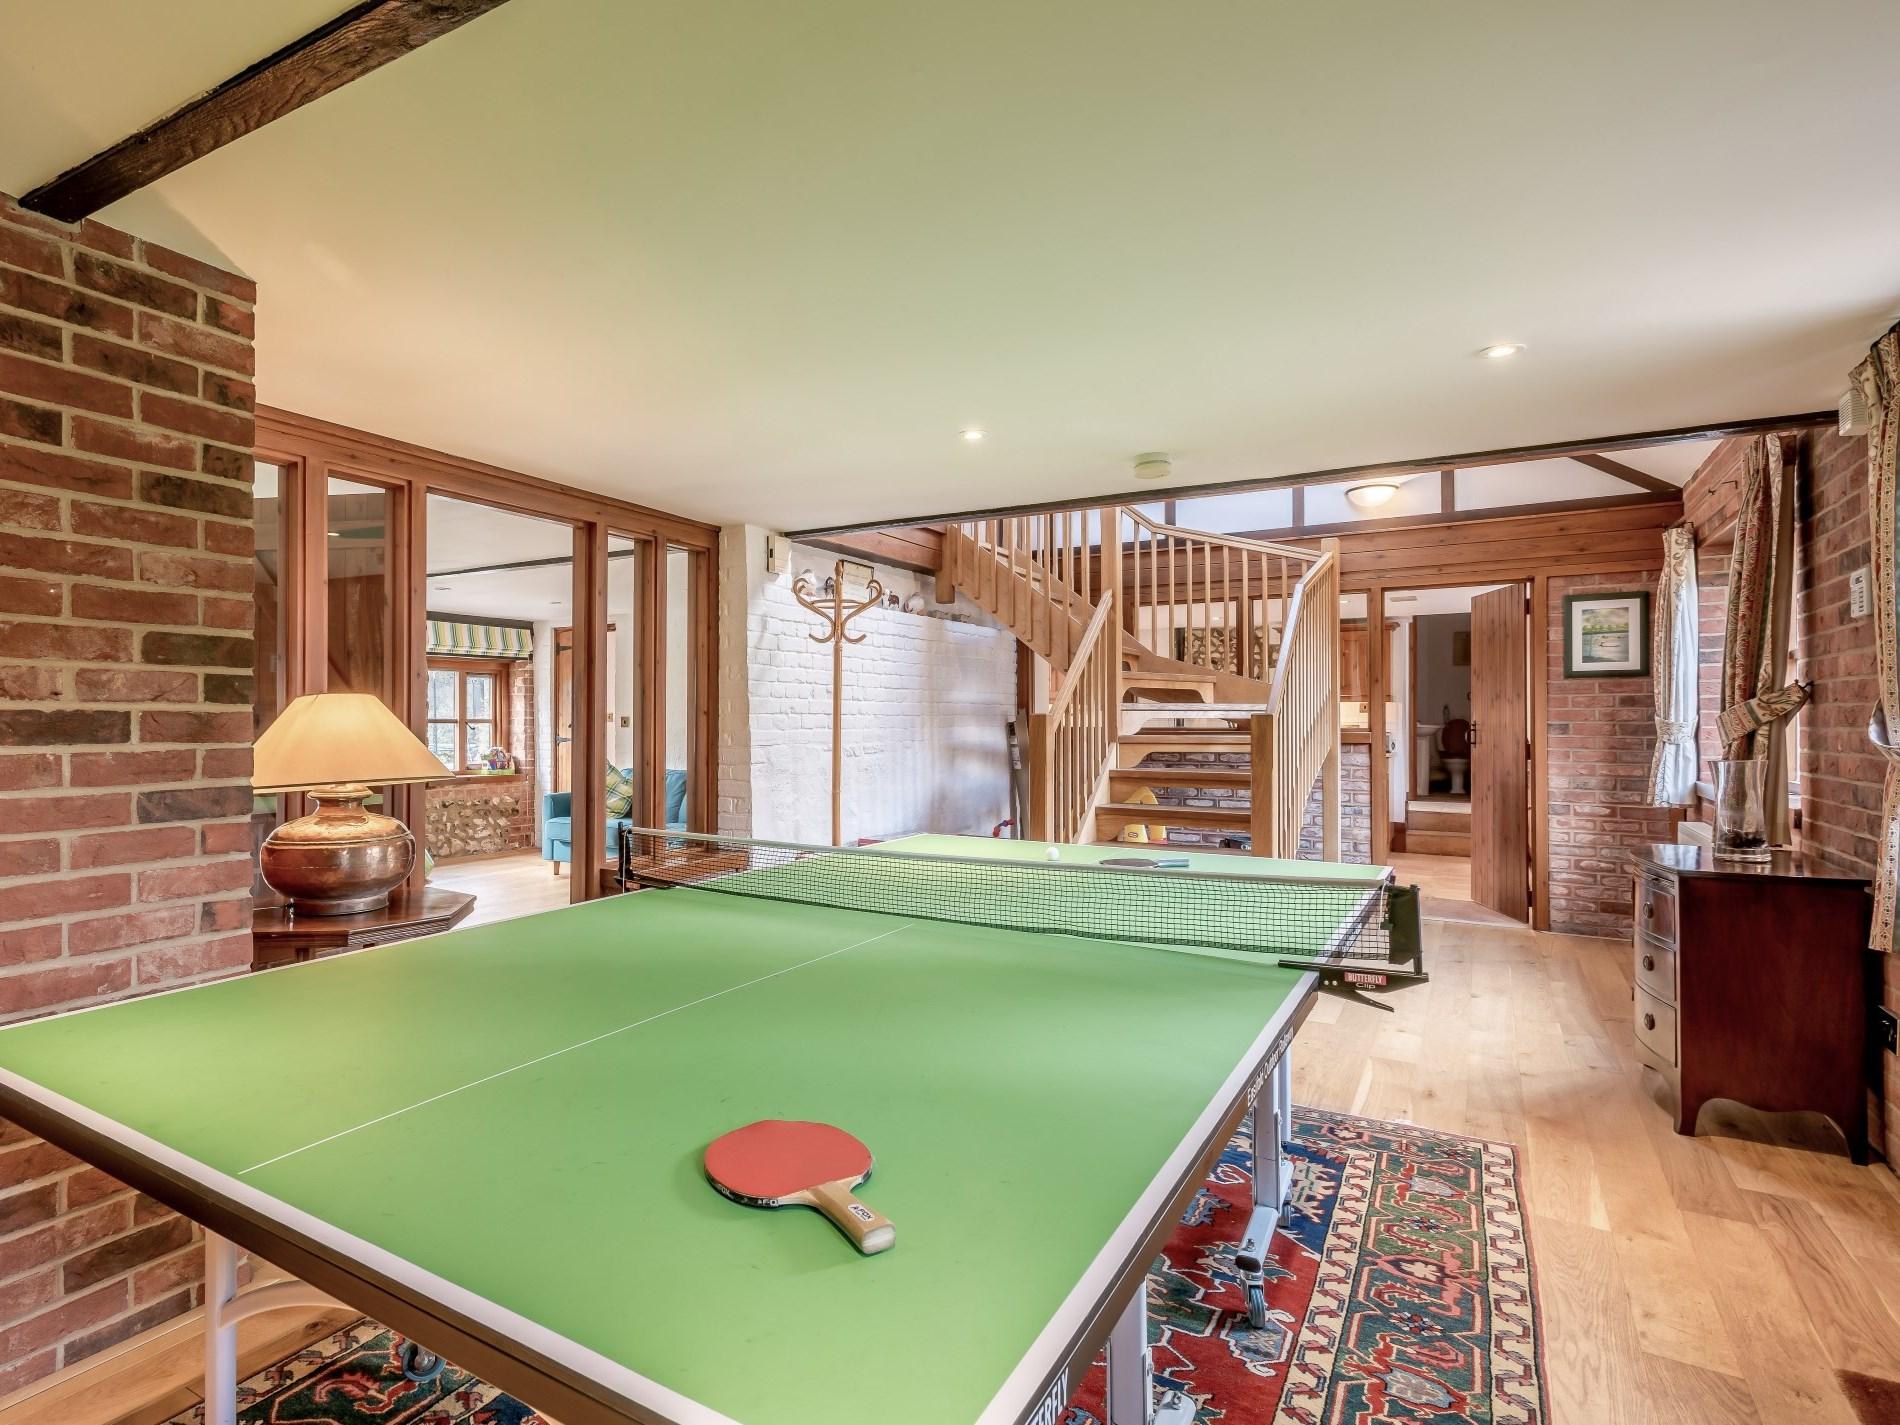 4 Bedroom House in Norfolk, East Anglia